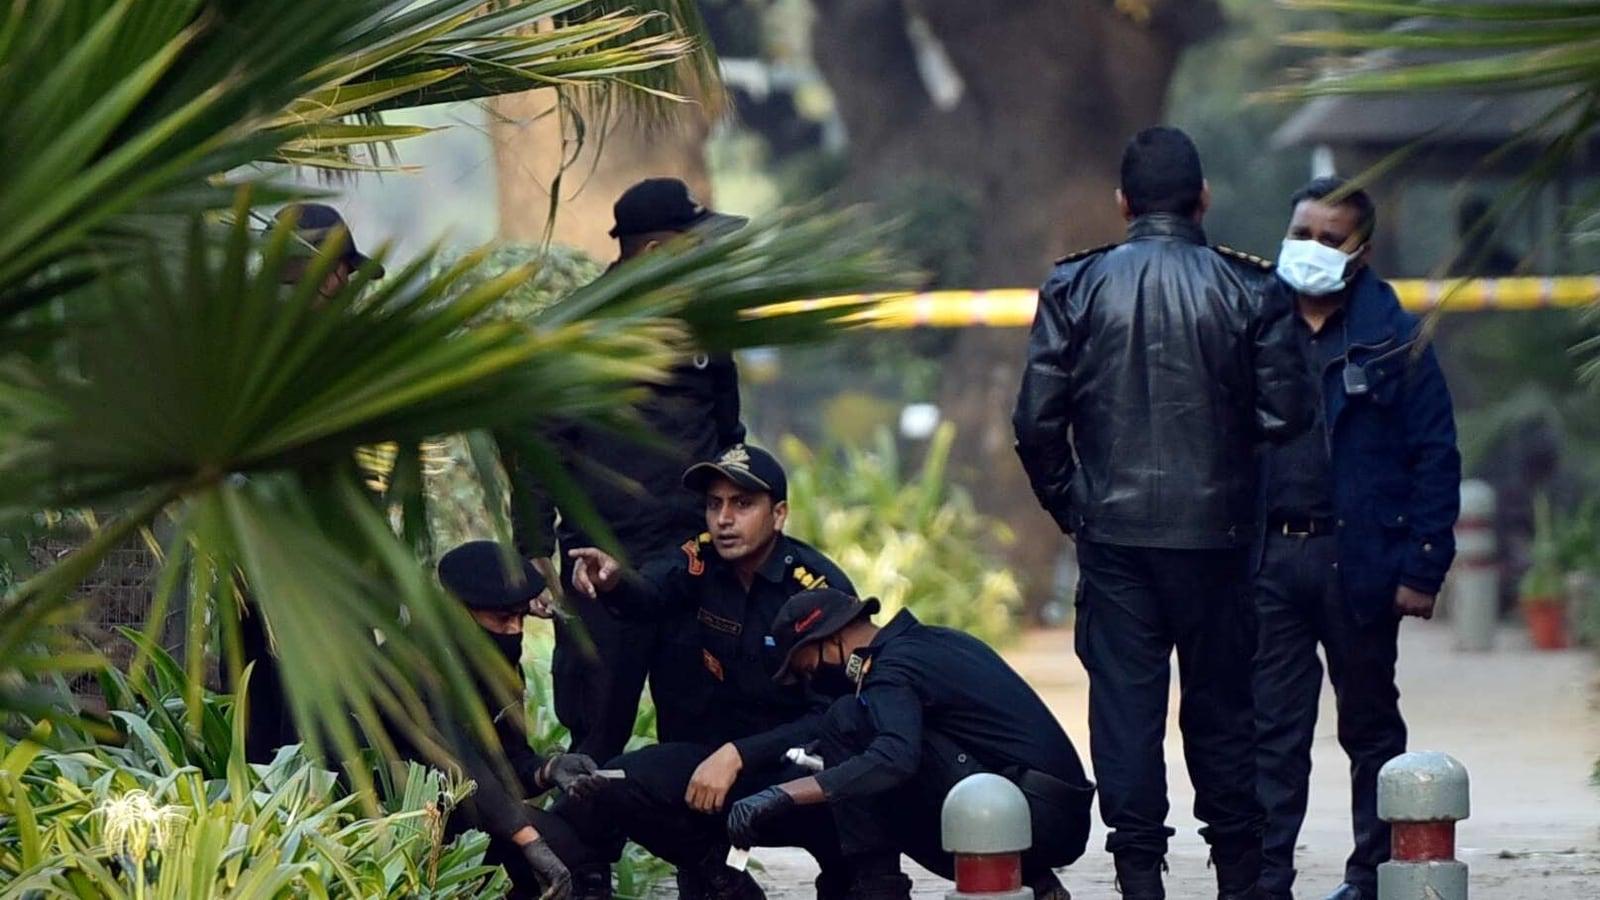 Iran guided Israeli embassy blast through local module, upsets India: Officials - Hindustan Times